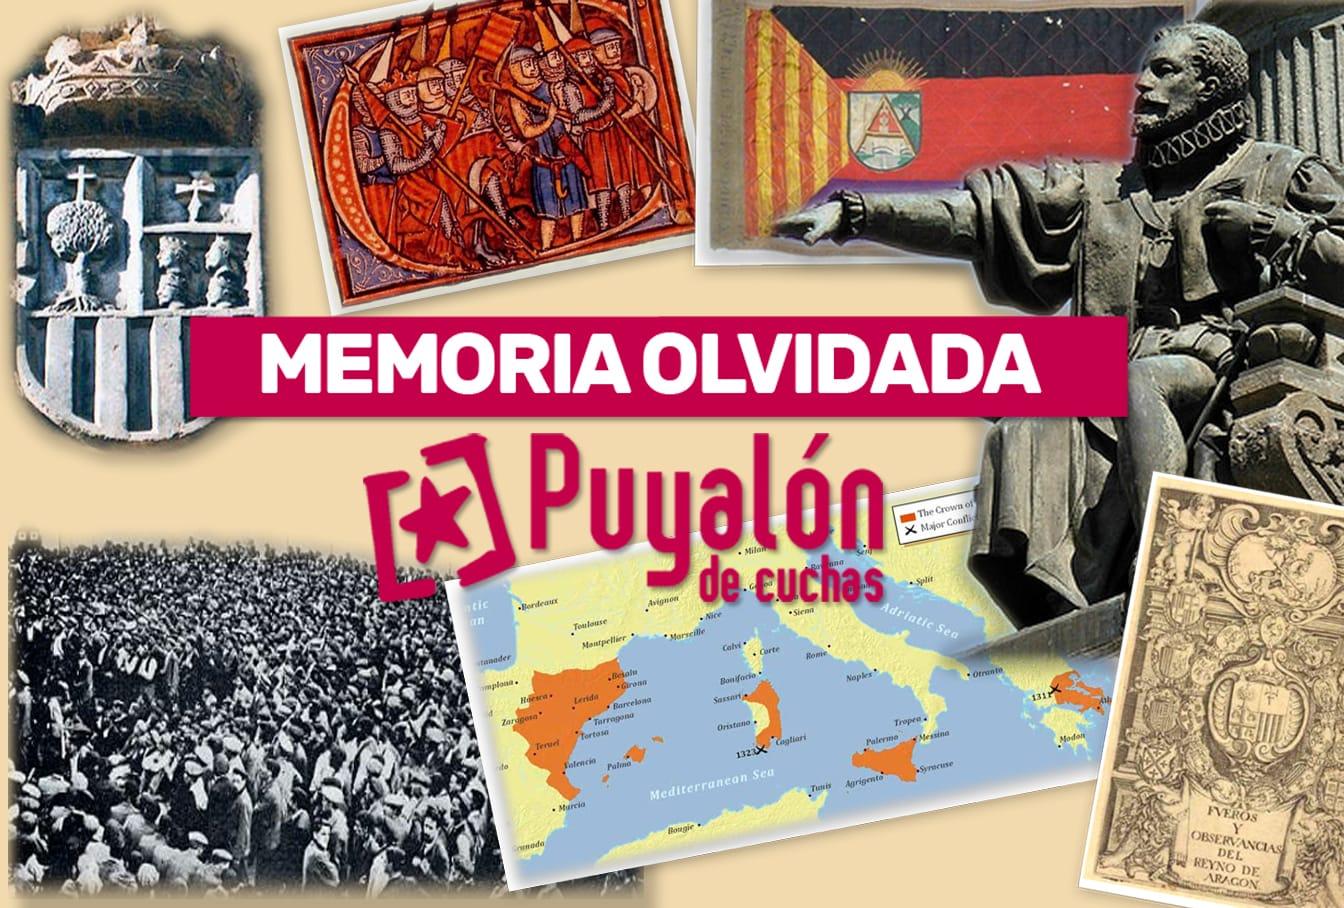 #MemoriaOlvidada